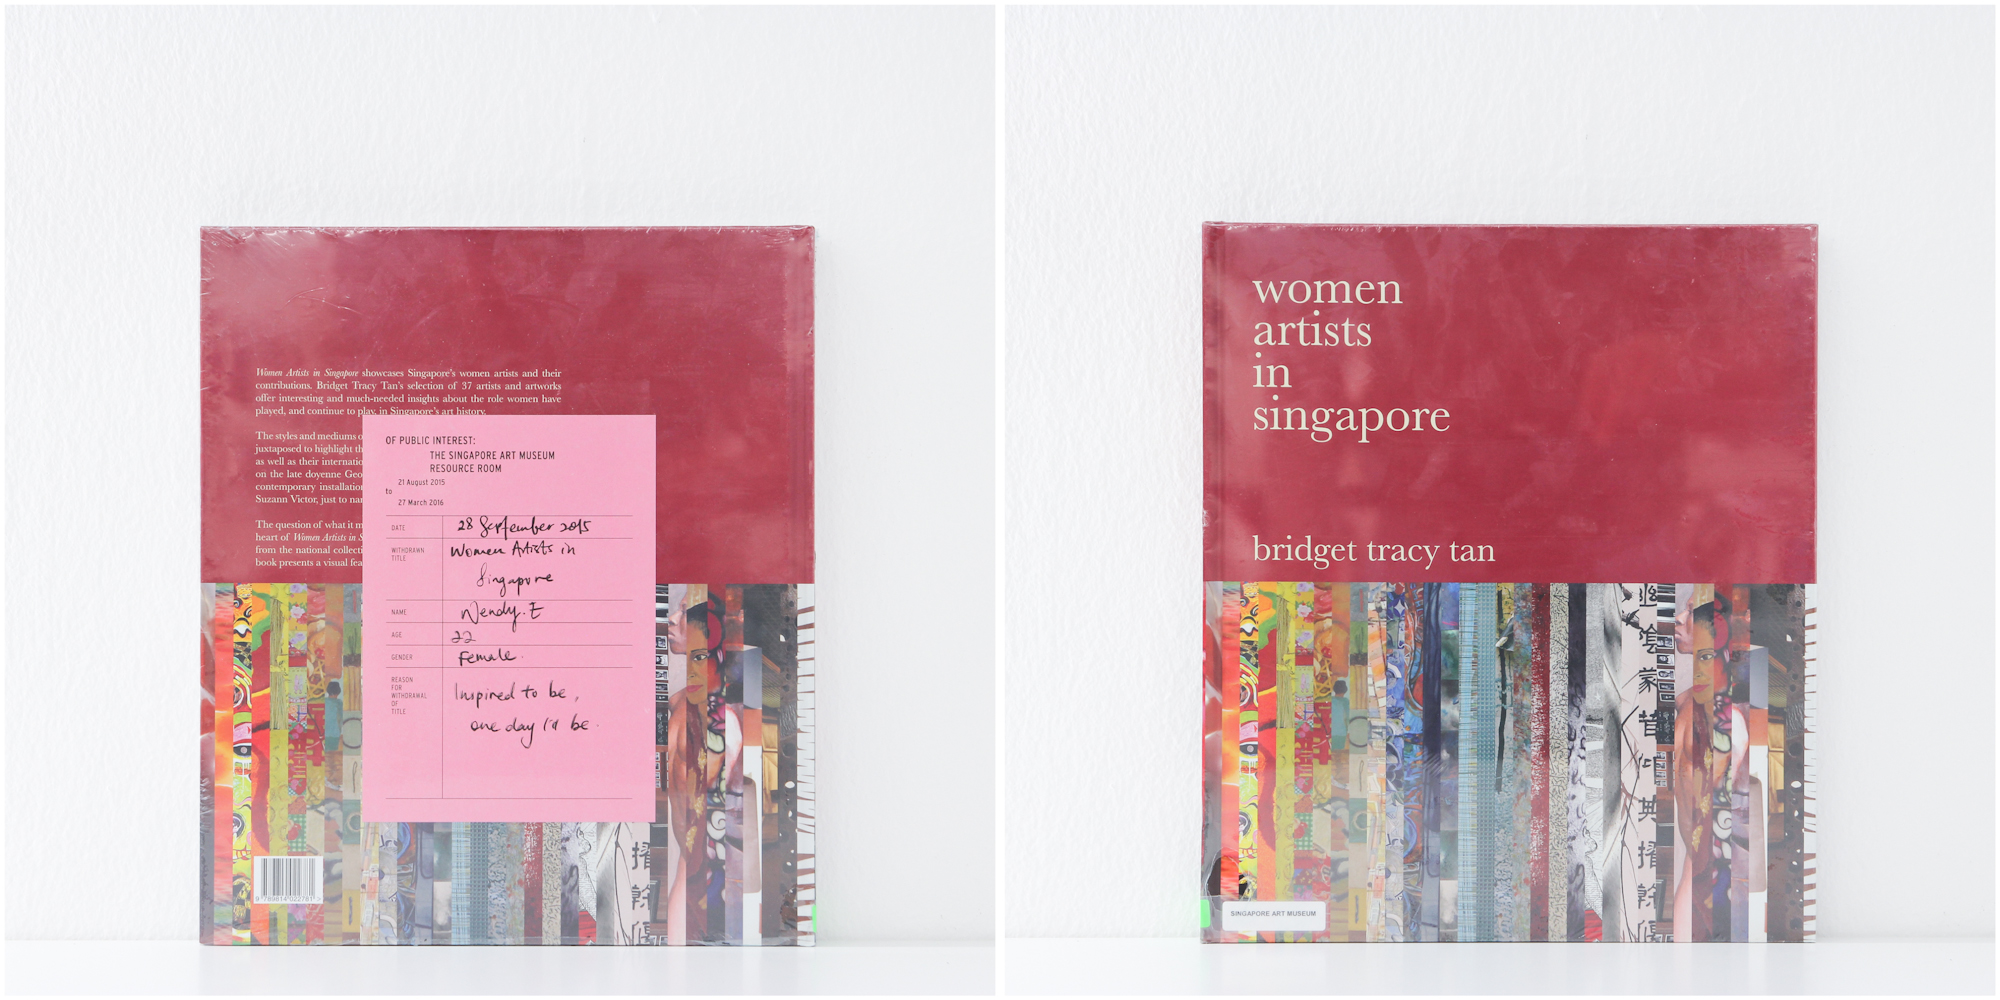 'Women Artists in Singapore', 28/9/15, Wendy E, 22, Female